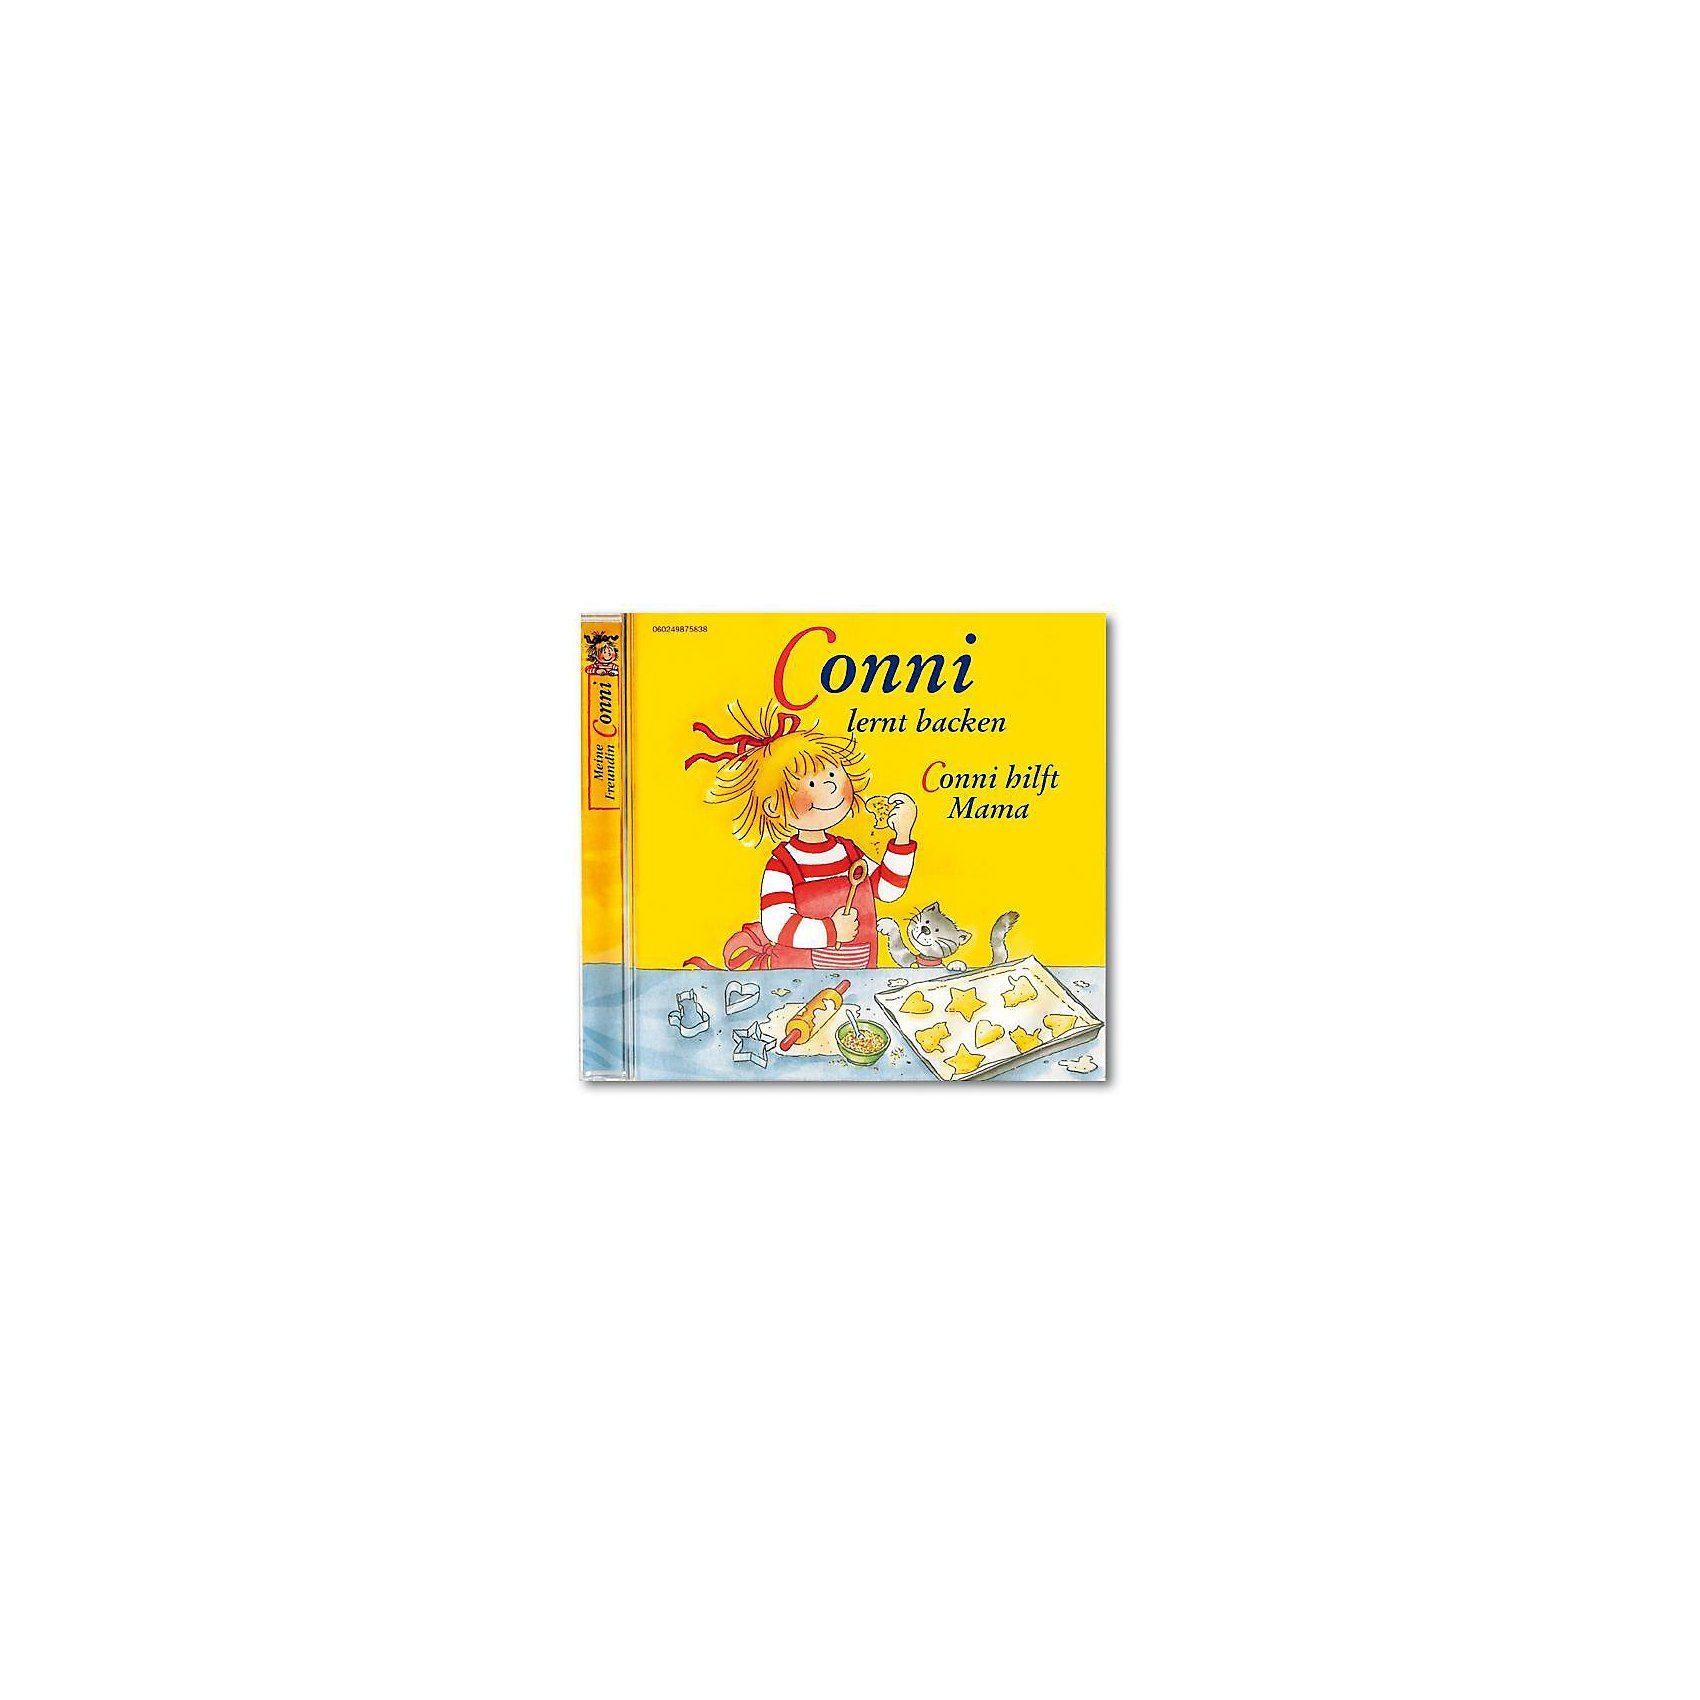 Universal CD Conni (hilft Mama/ lernt backen)